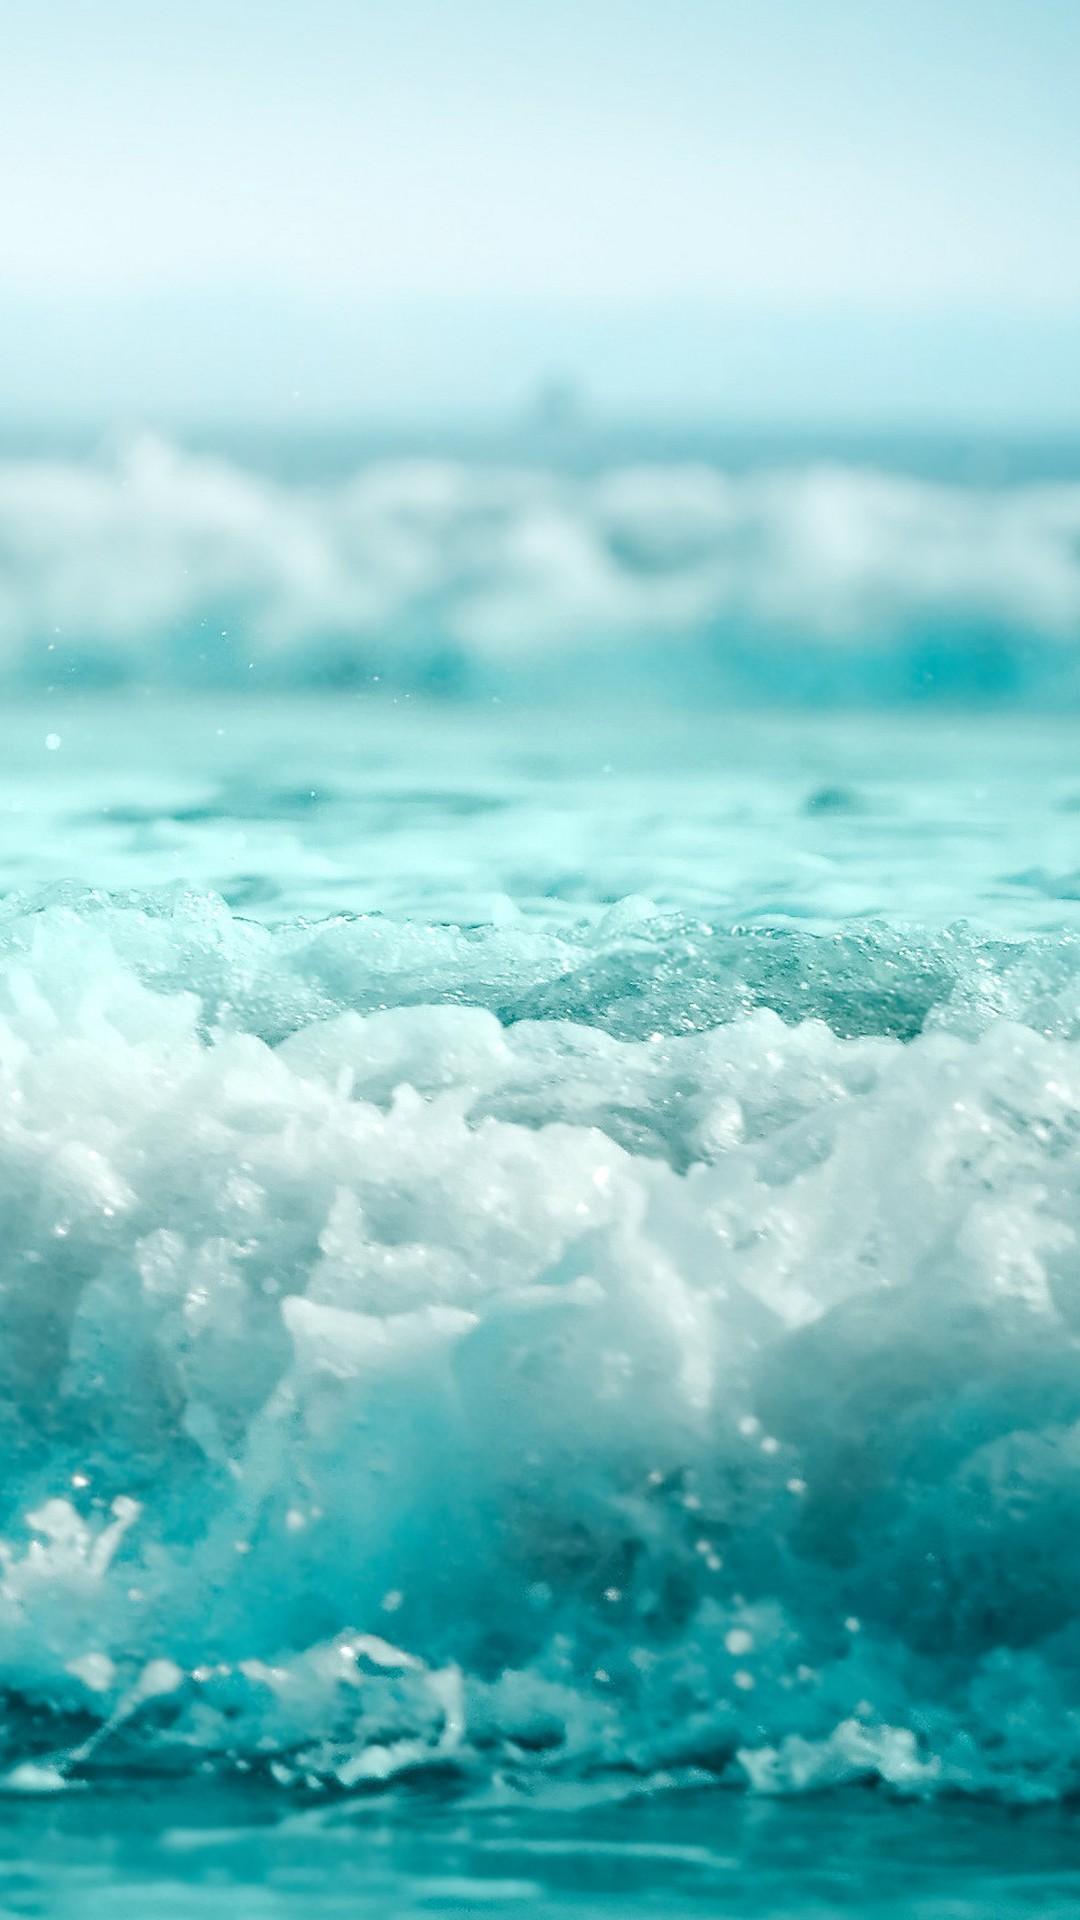 Nature iPhone 6 Plus Wallpapers – Blue Sea Waves Splashing iPhone 6 Plus HD  Wallpaper